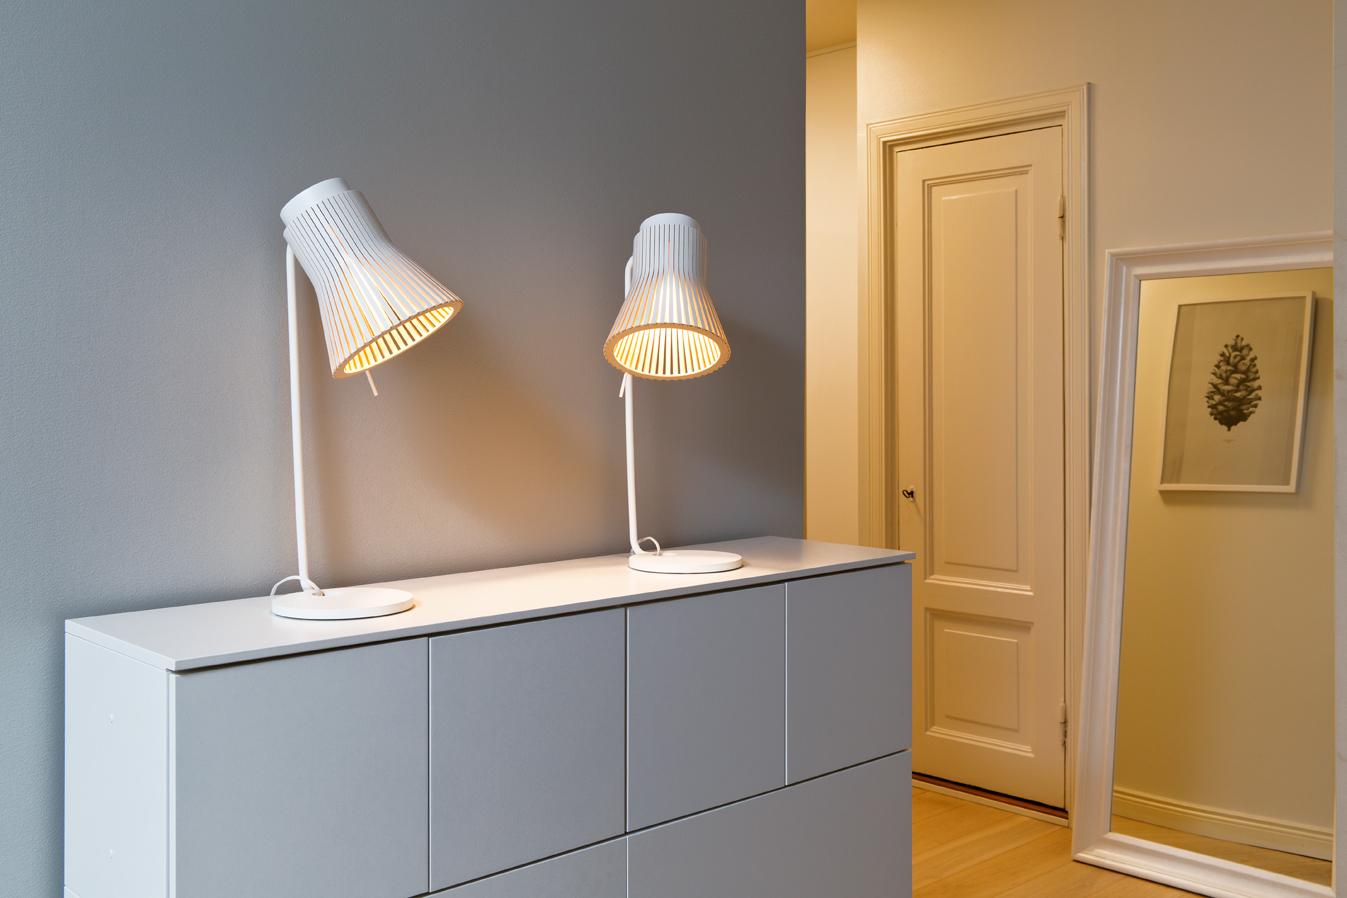 Petite 4620 bordslampa i hemmet